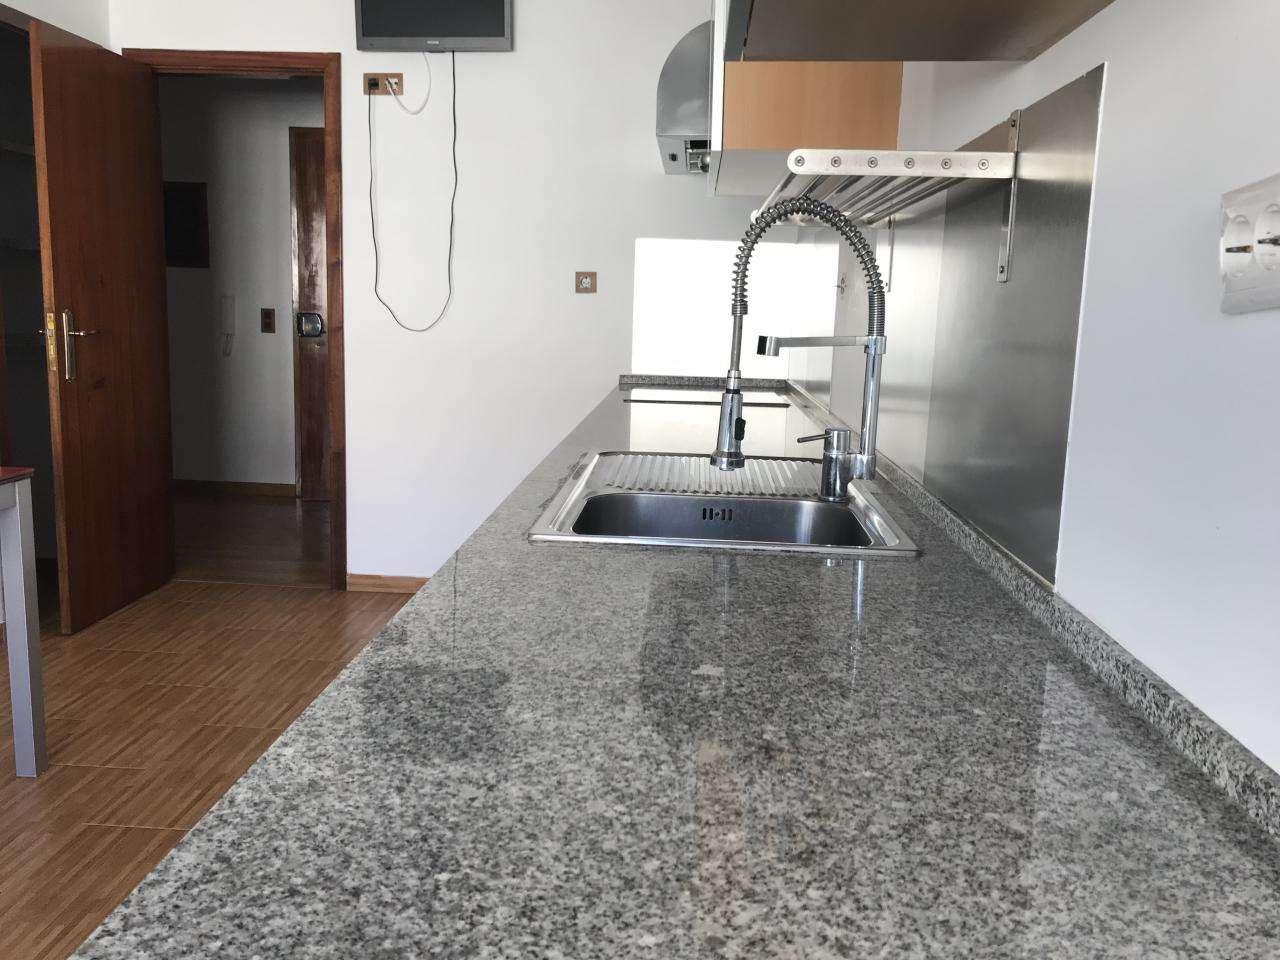 Apartamento para comprar, Montijo e Afonsoeiro, Montijo, Setúbal - Foto 2